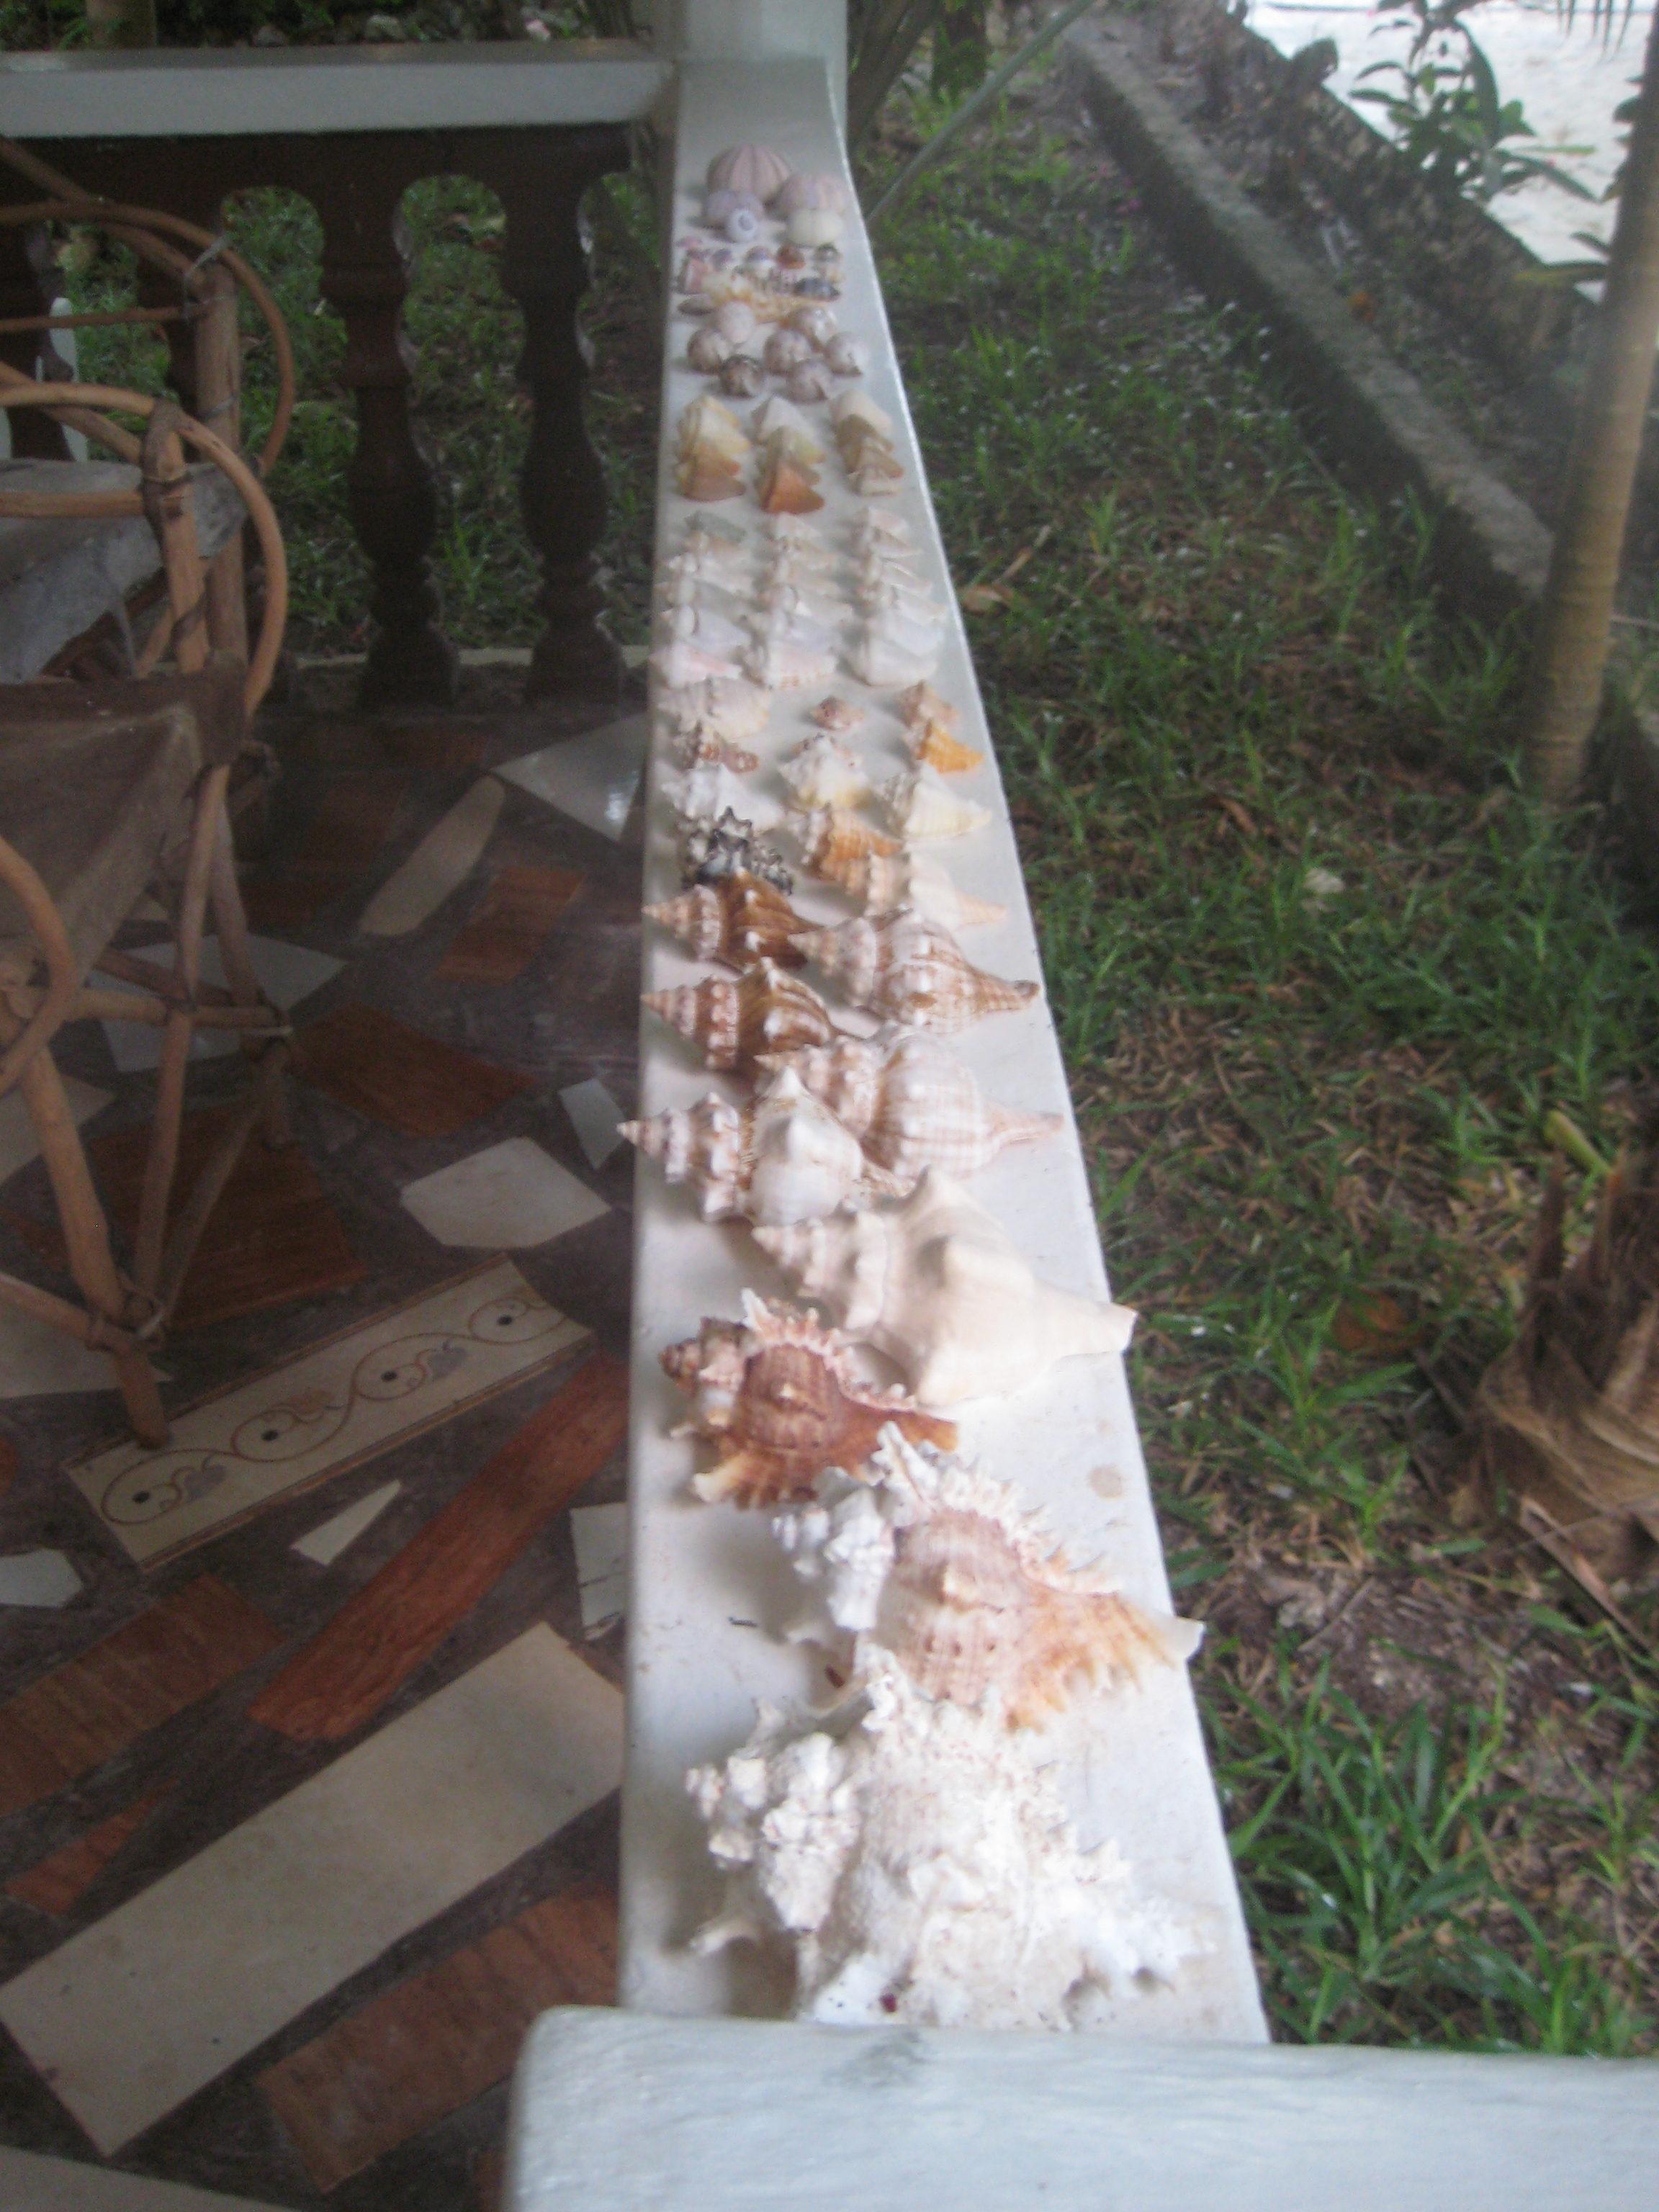 Zanzibar Shells used for the marriage proposal